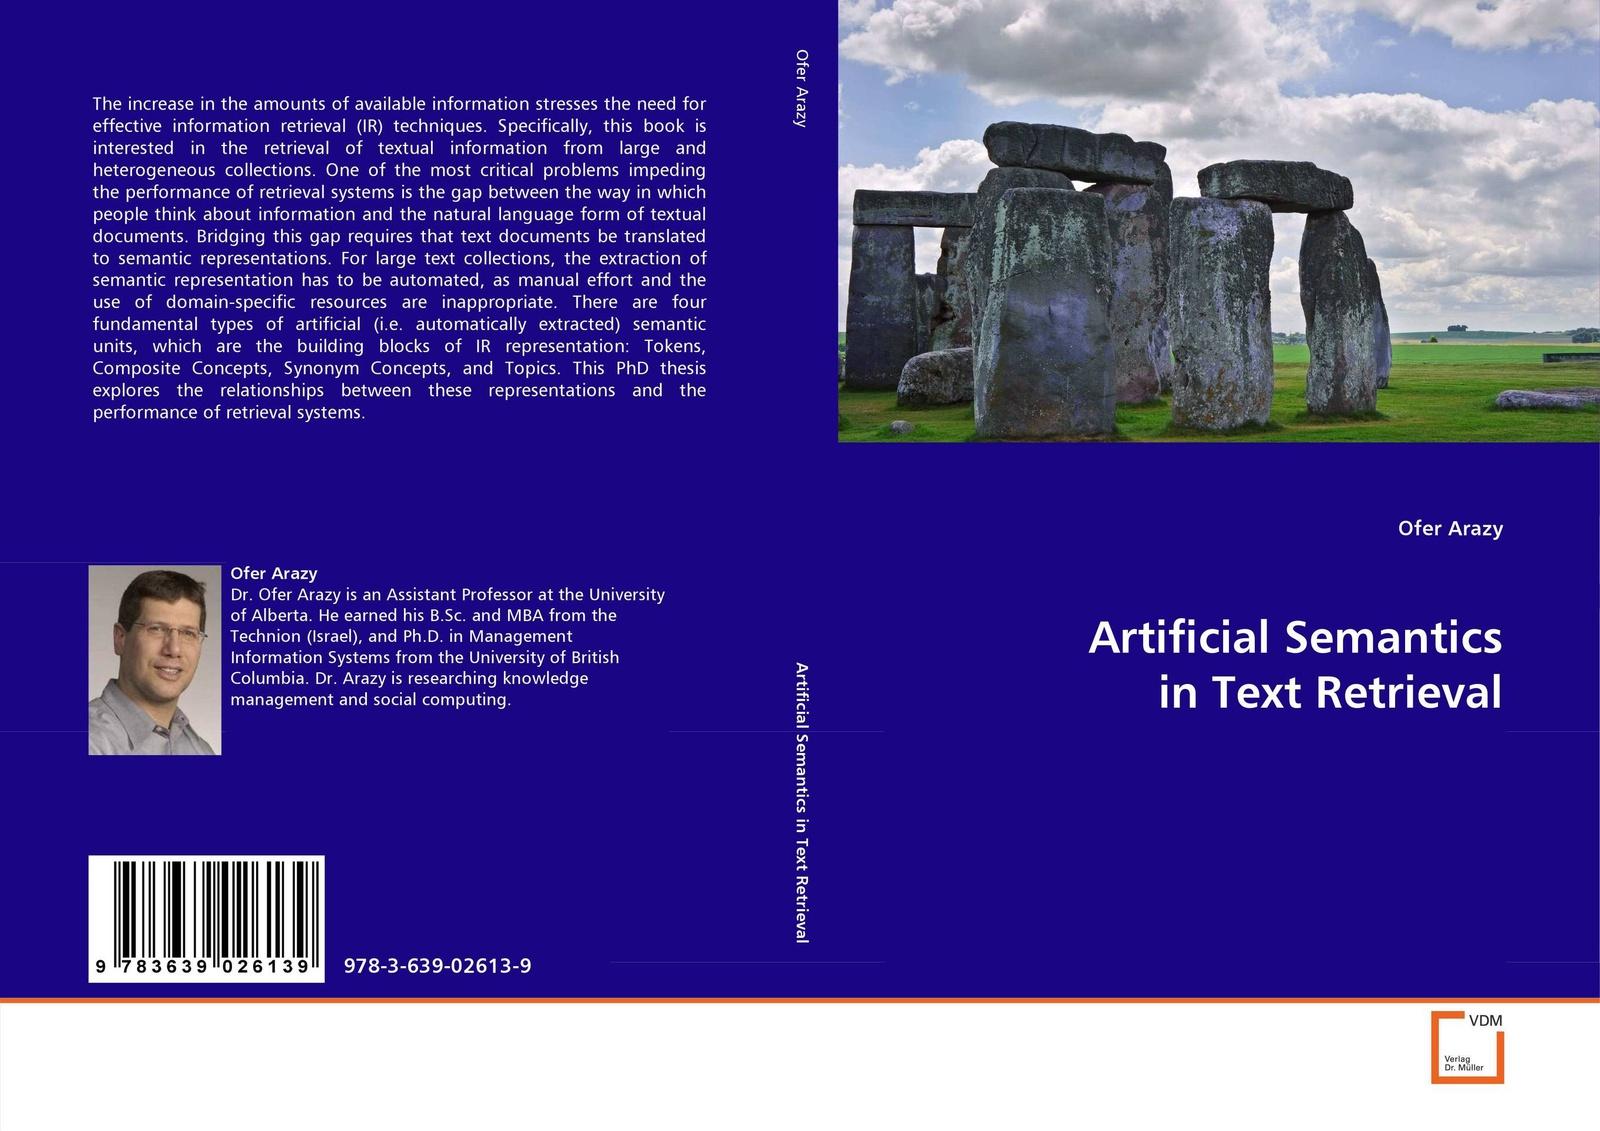 Ofer Arazy Artificial Semantics in Text Retrieval christian sallaberry geographical information retrieval in textual corpora